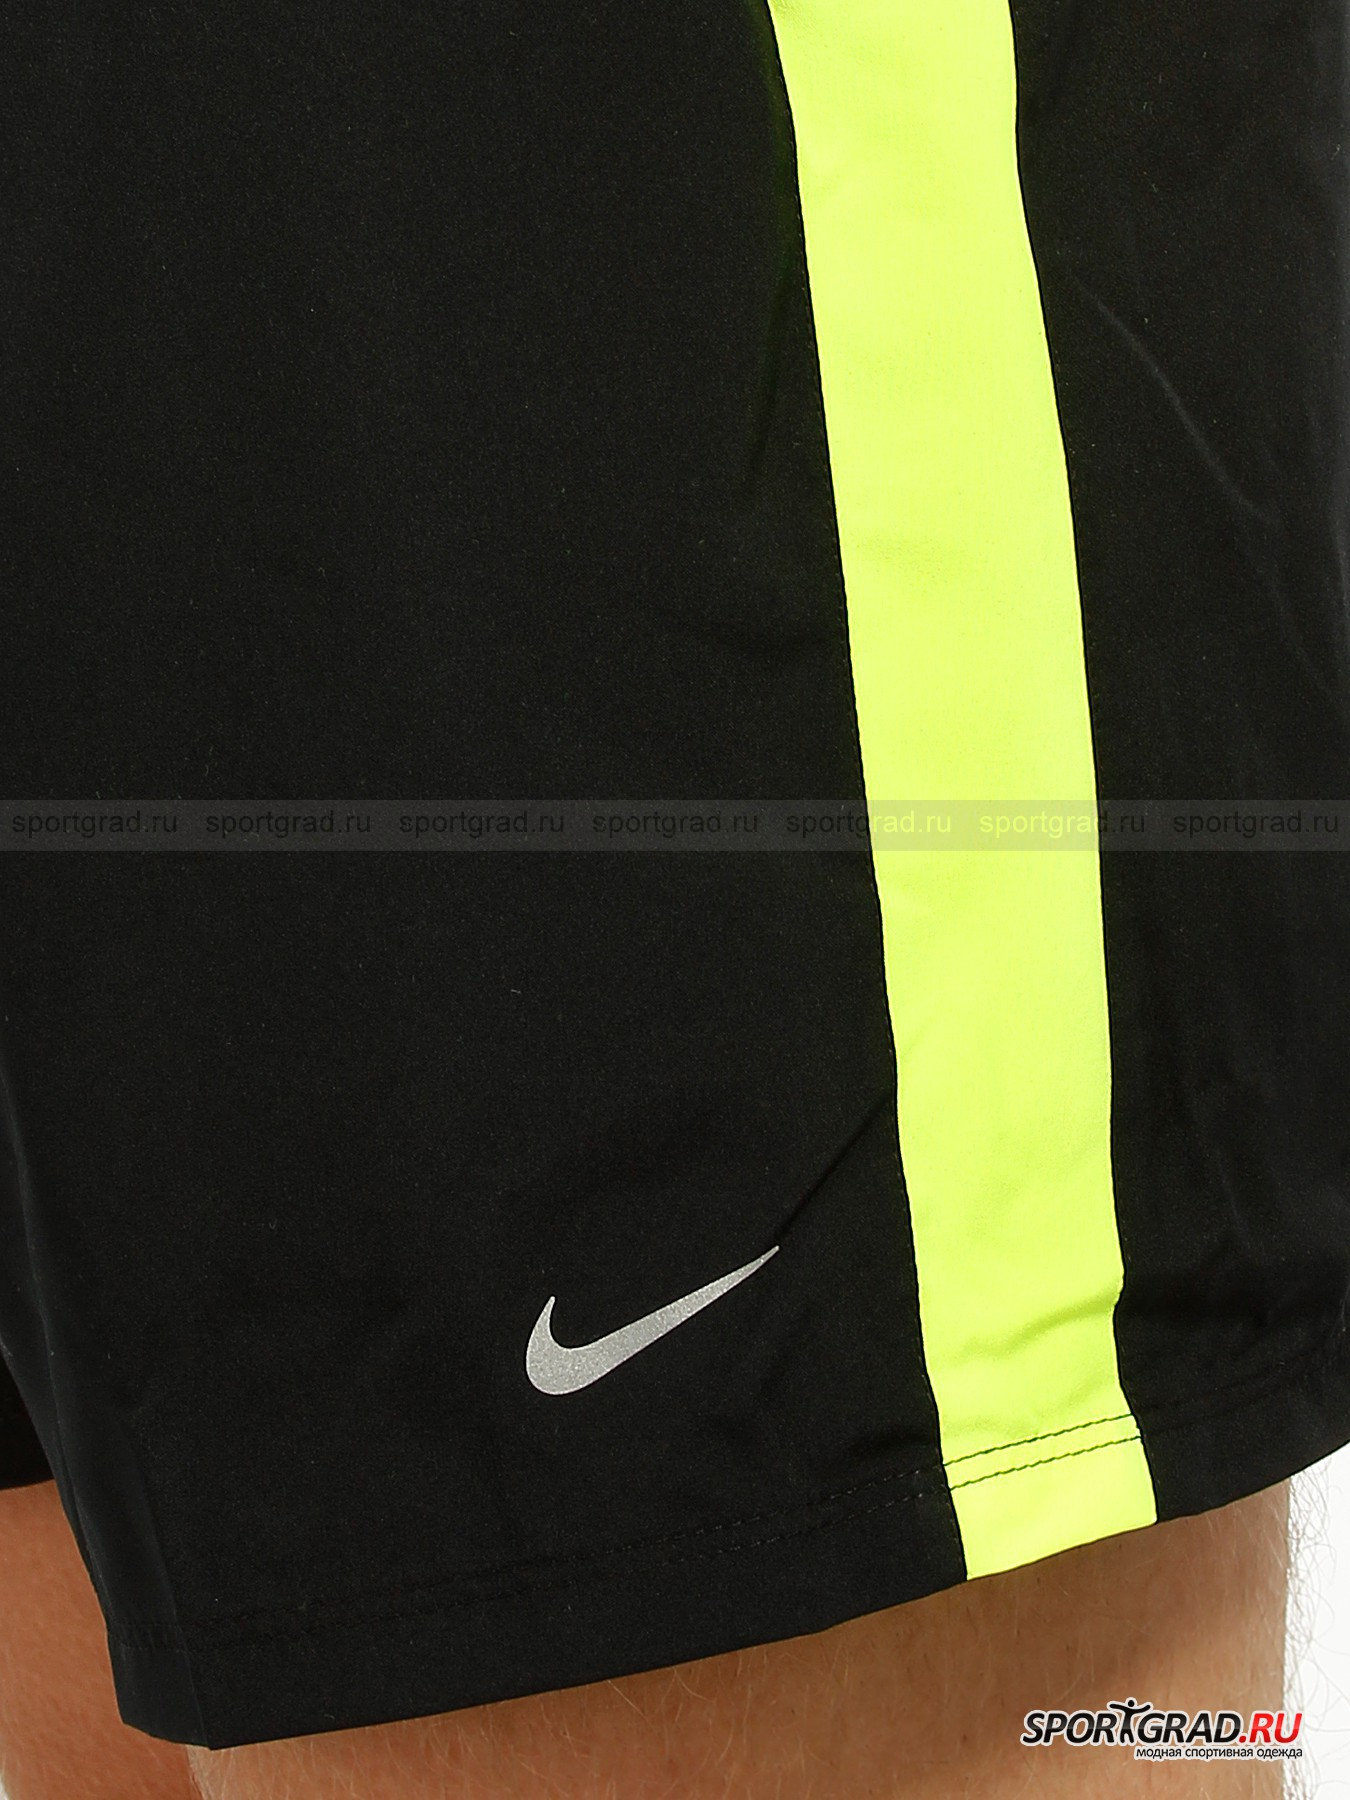 Шорты мужские Nike от Спортград